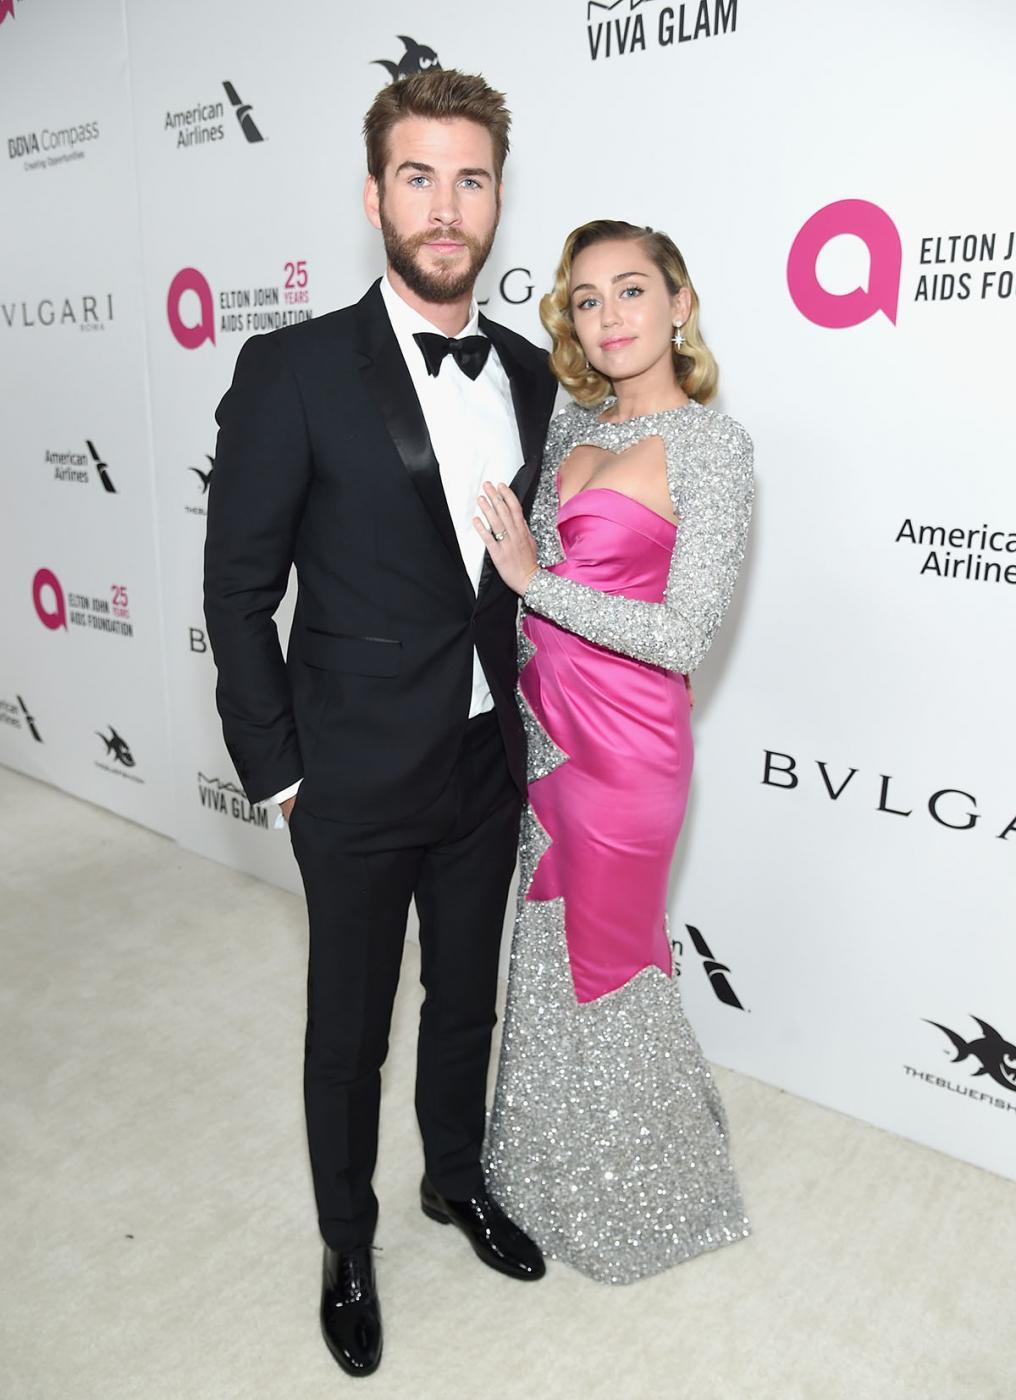 Miley Cyrus And Liam Hemsworth Pregnant People think Mi...